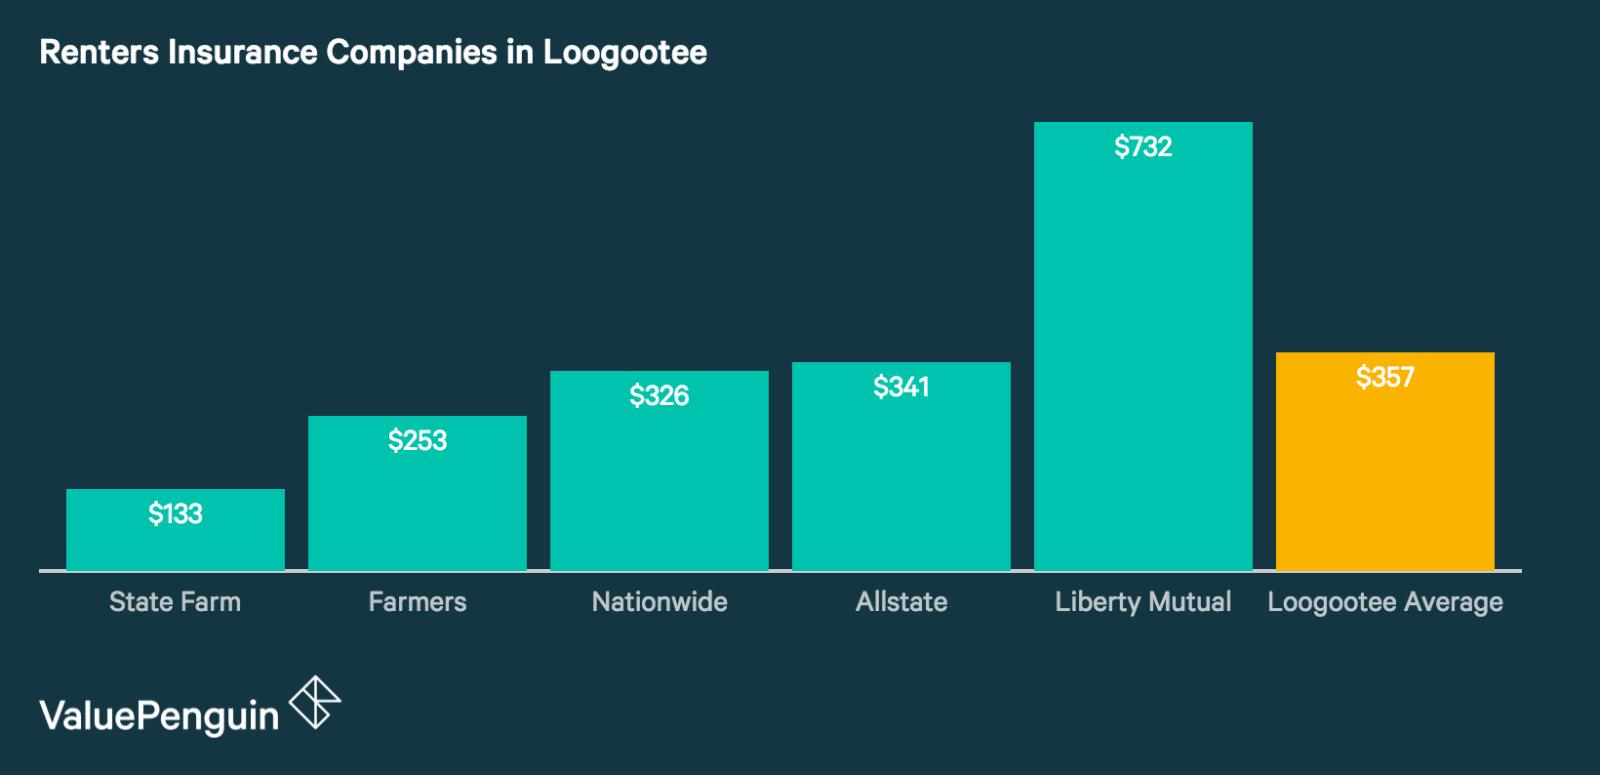 Renters Insurance Rates in Loogootee